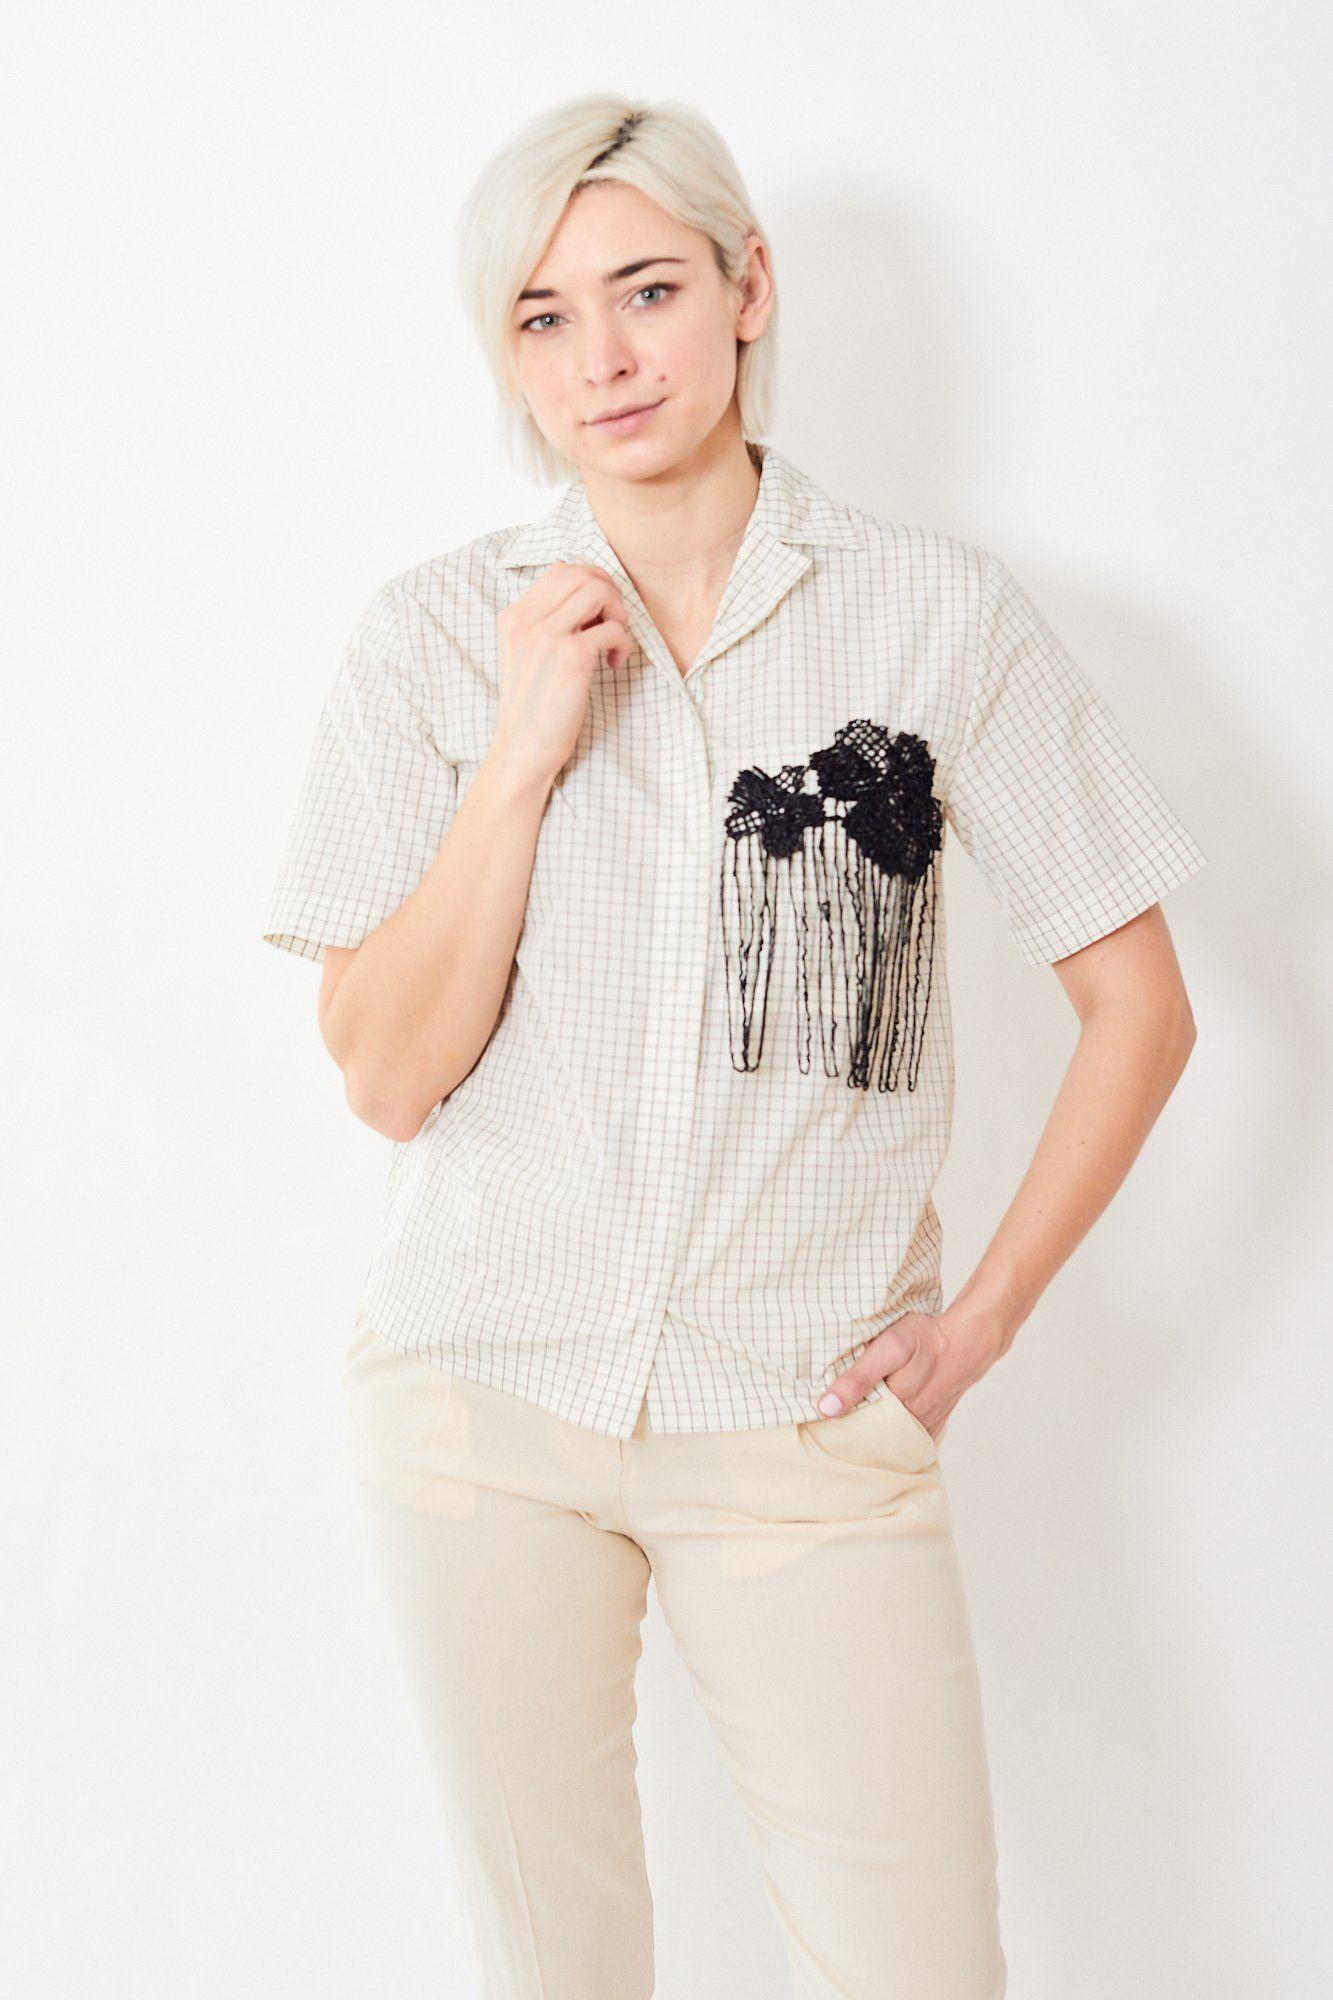 Chemise Tela Flair – IT 38 (US 2) / Blanc / Noir   – Products